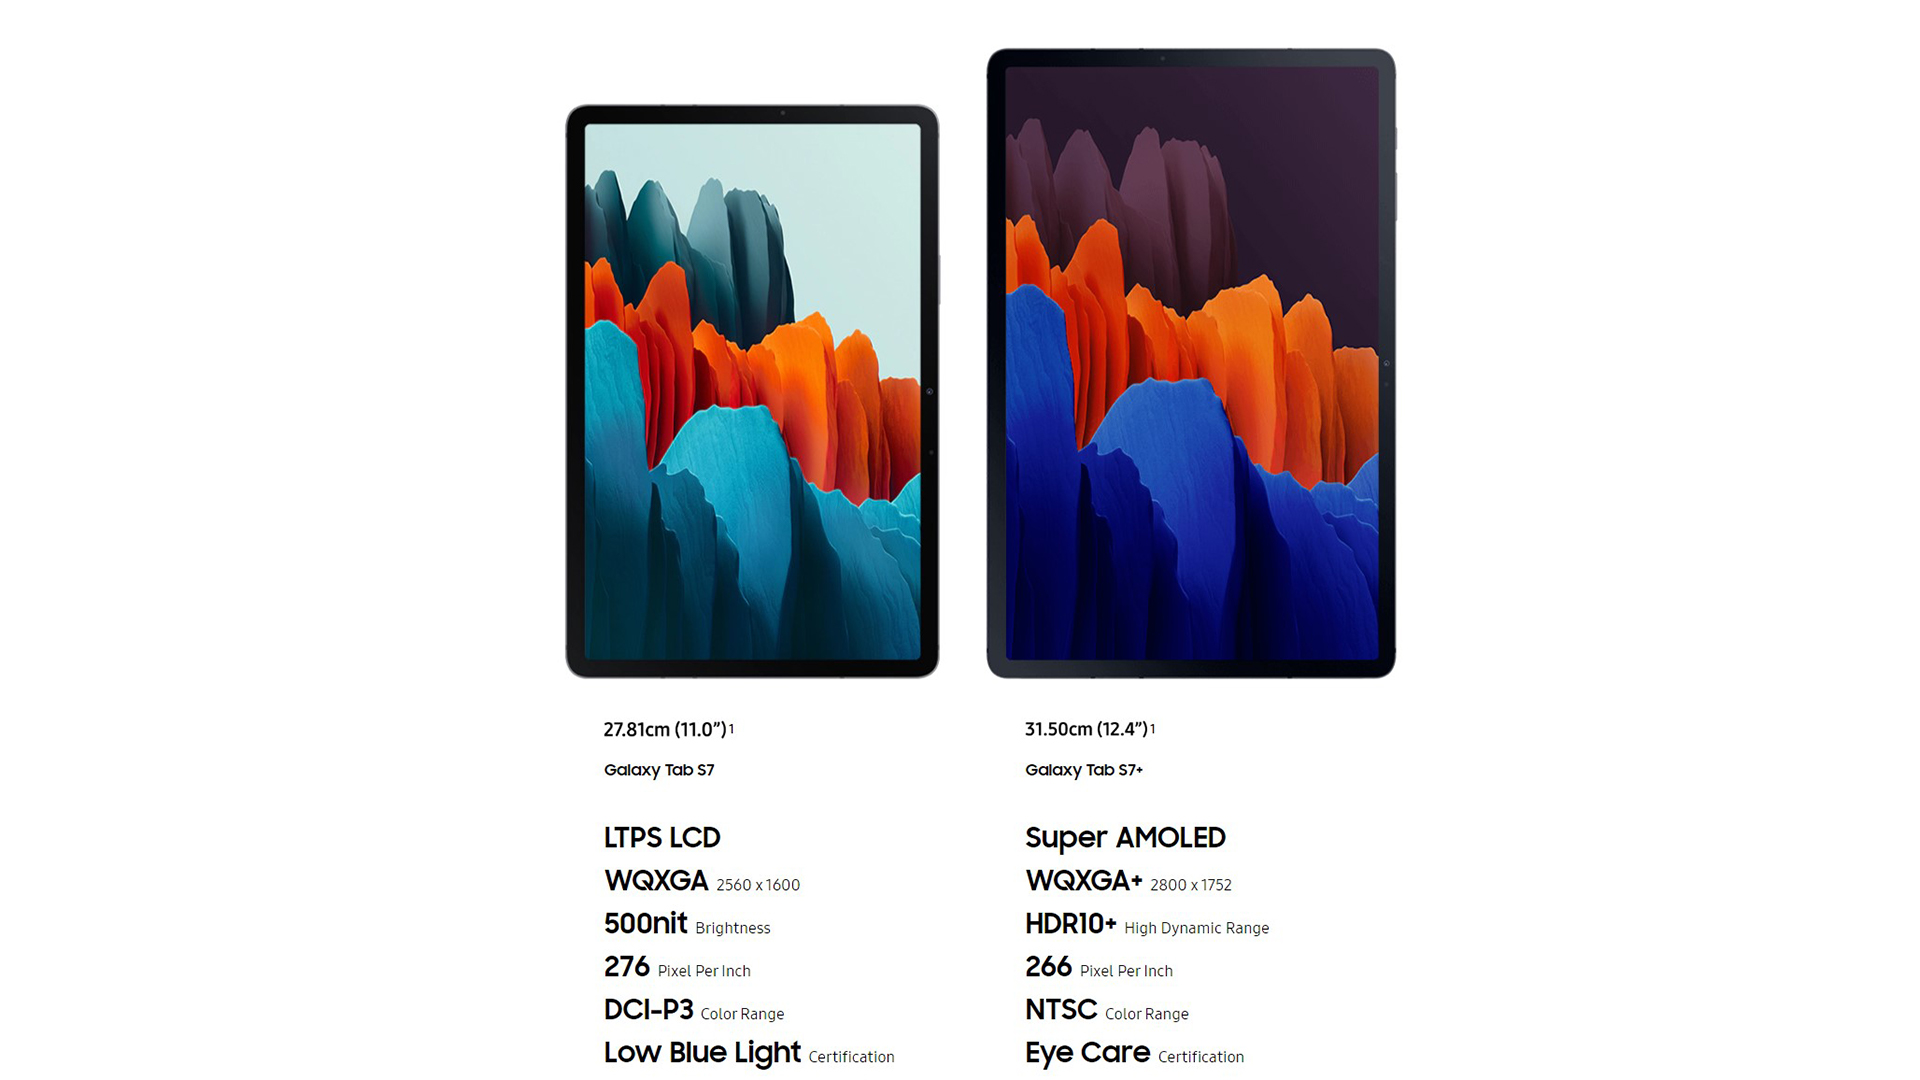 Samsung Galaxy Tab S7, Tab S7 Plus Screen Differences